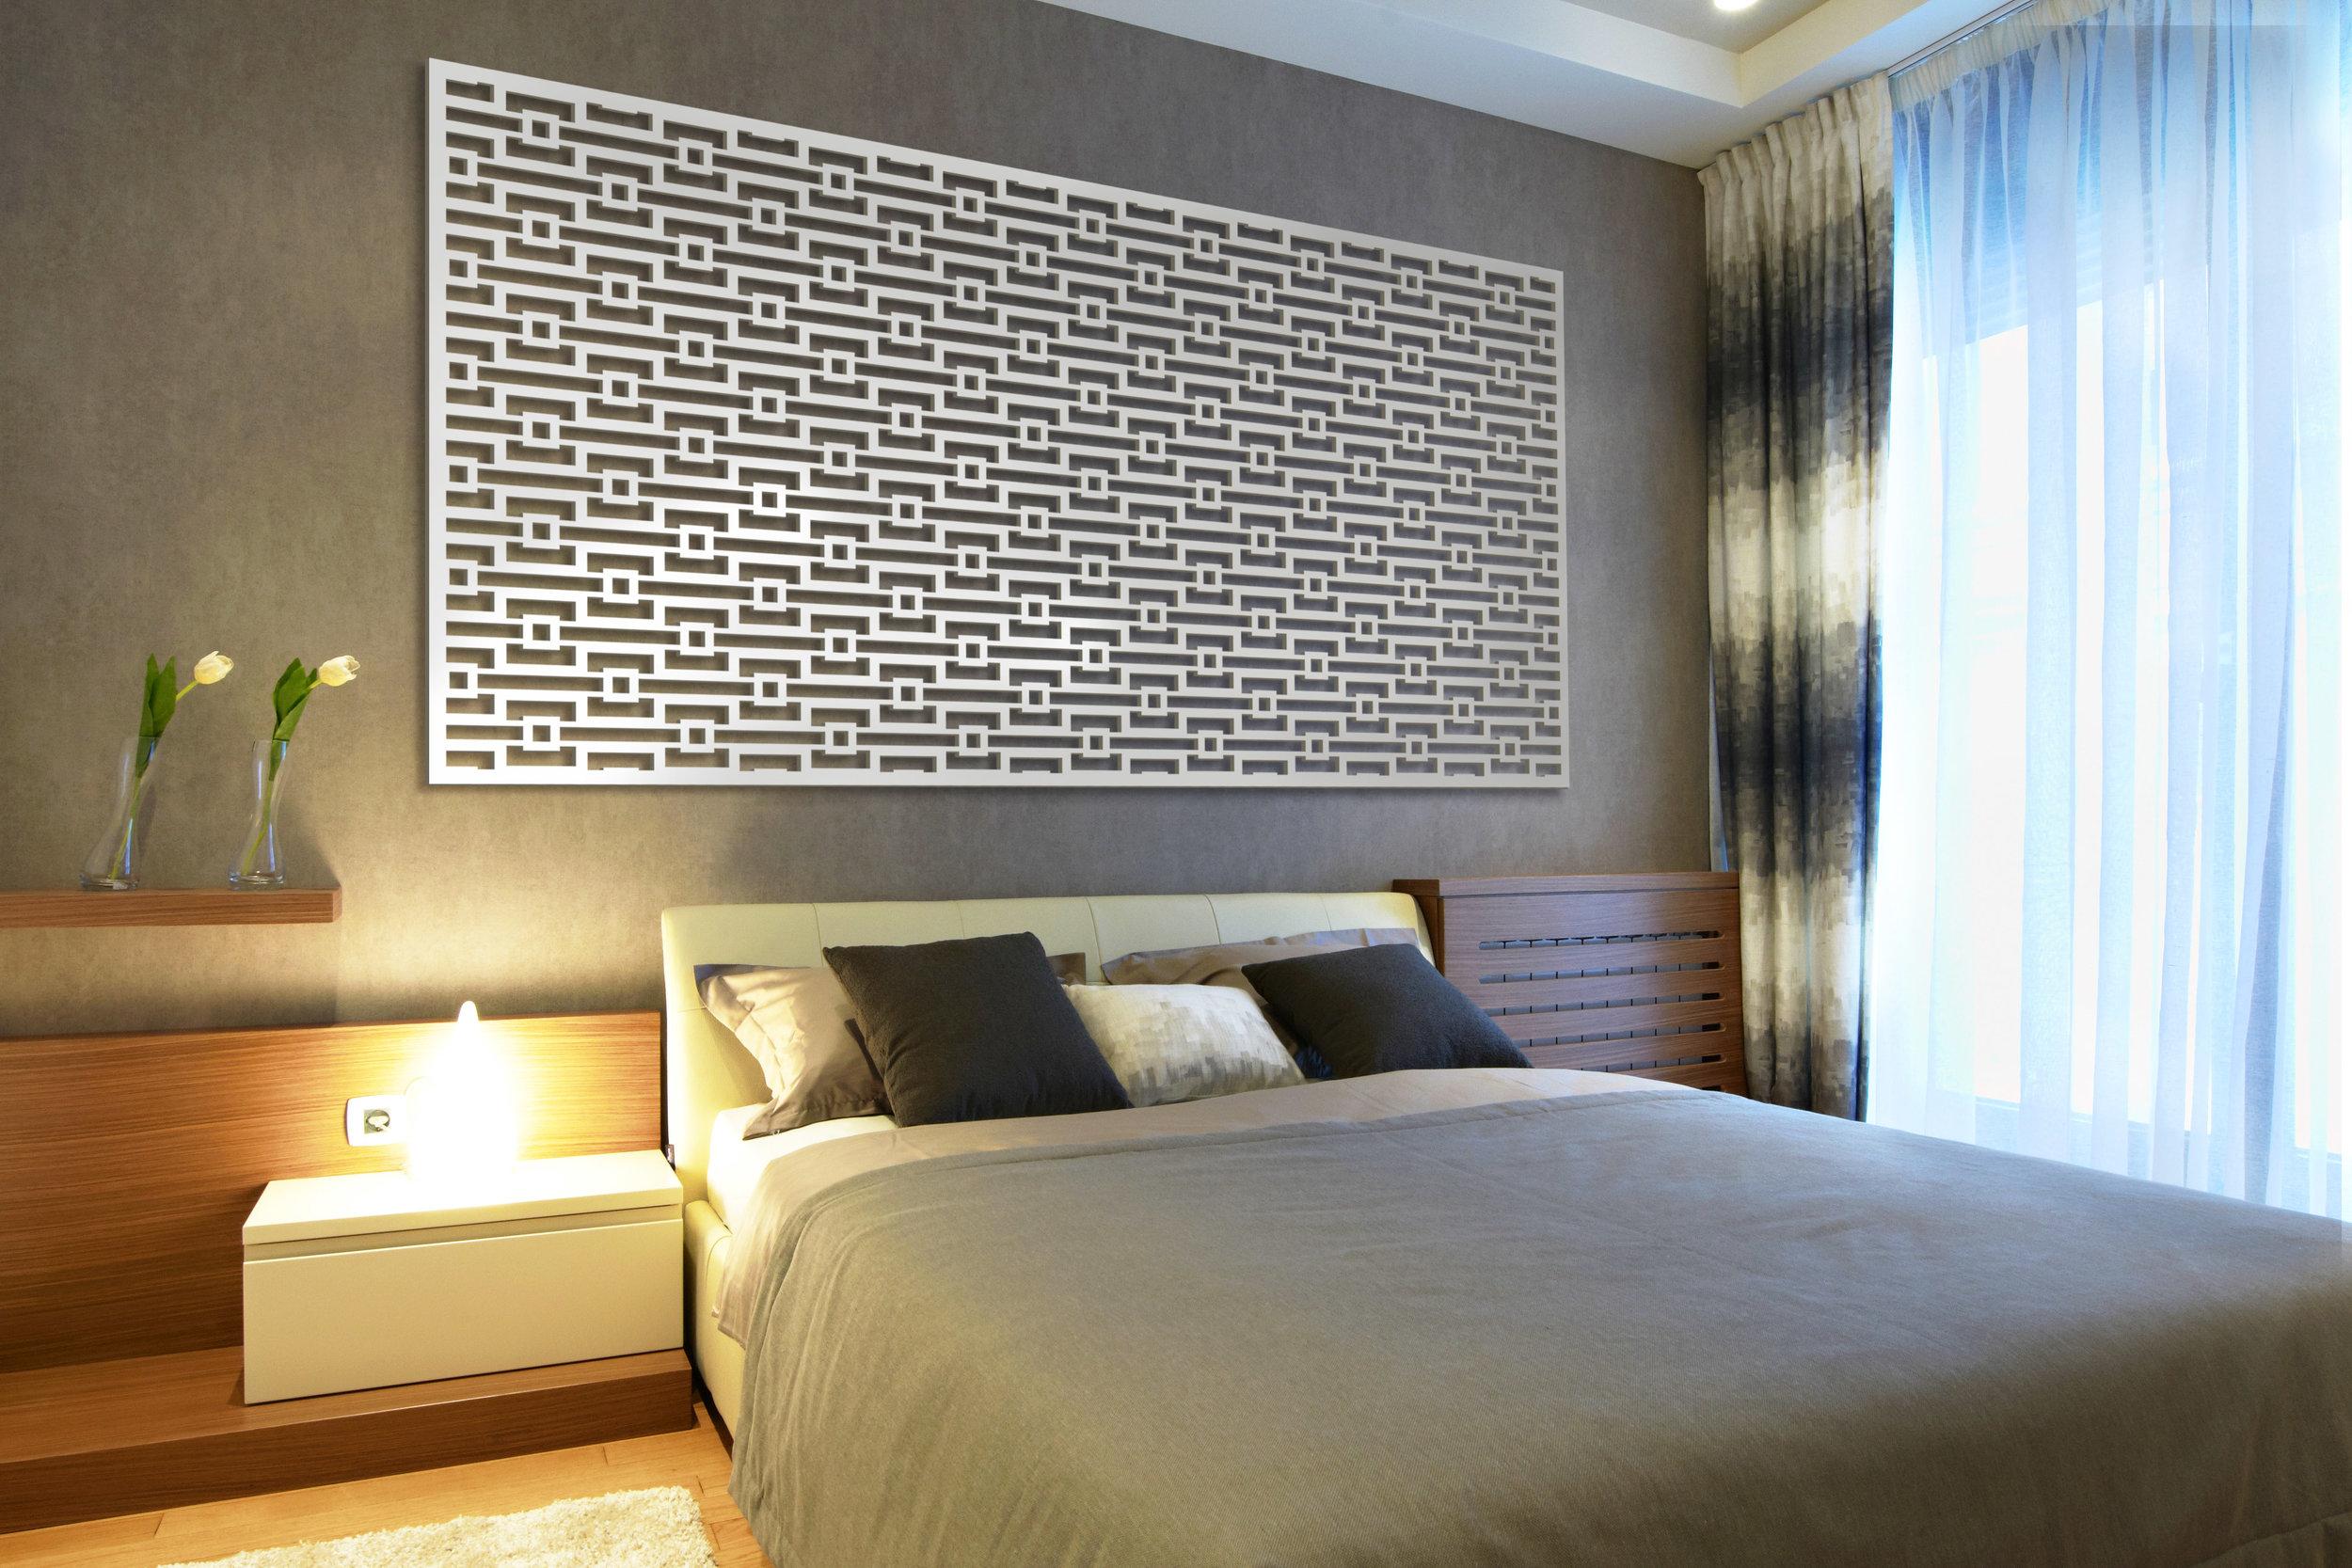 Installation Rendering C   Mod Geometric decorative hotel wall panel - painted